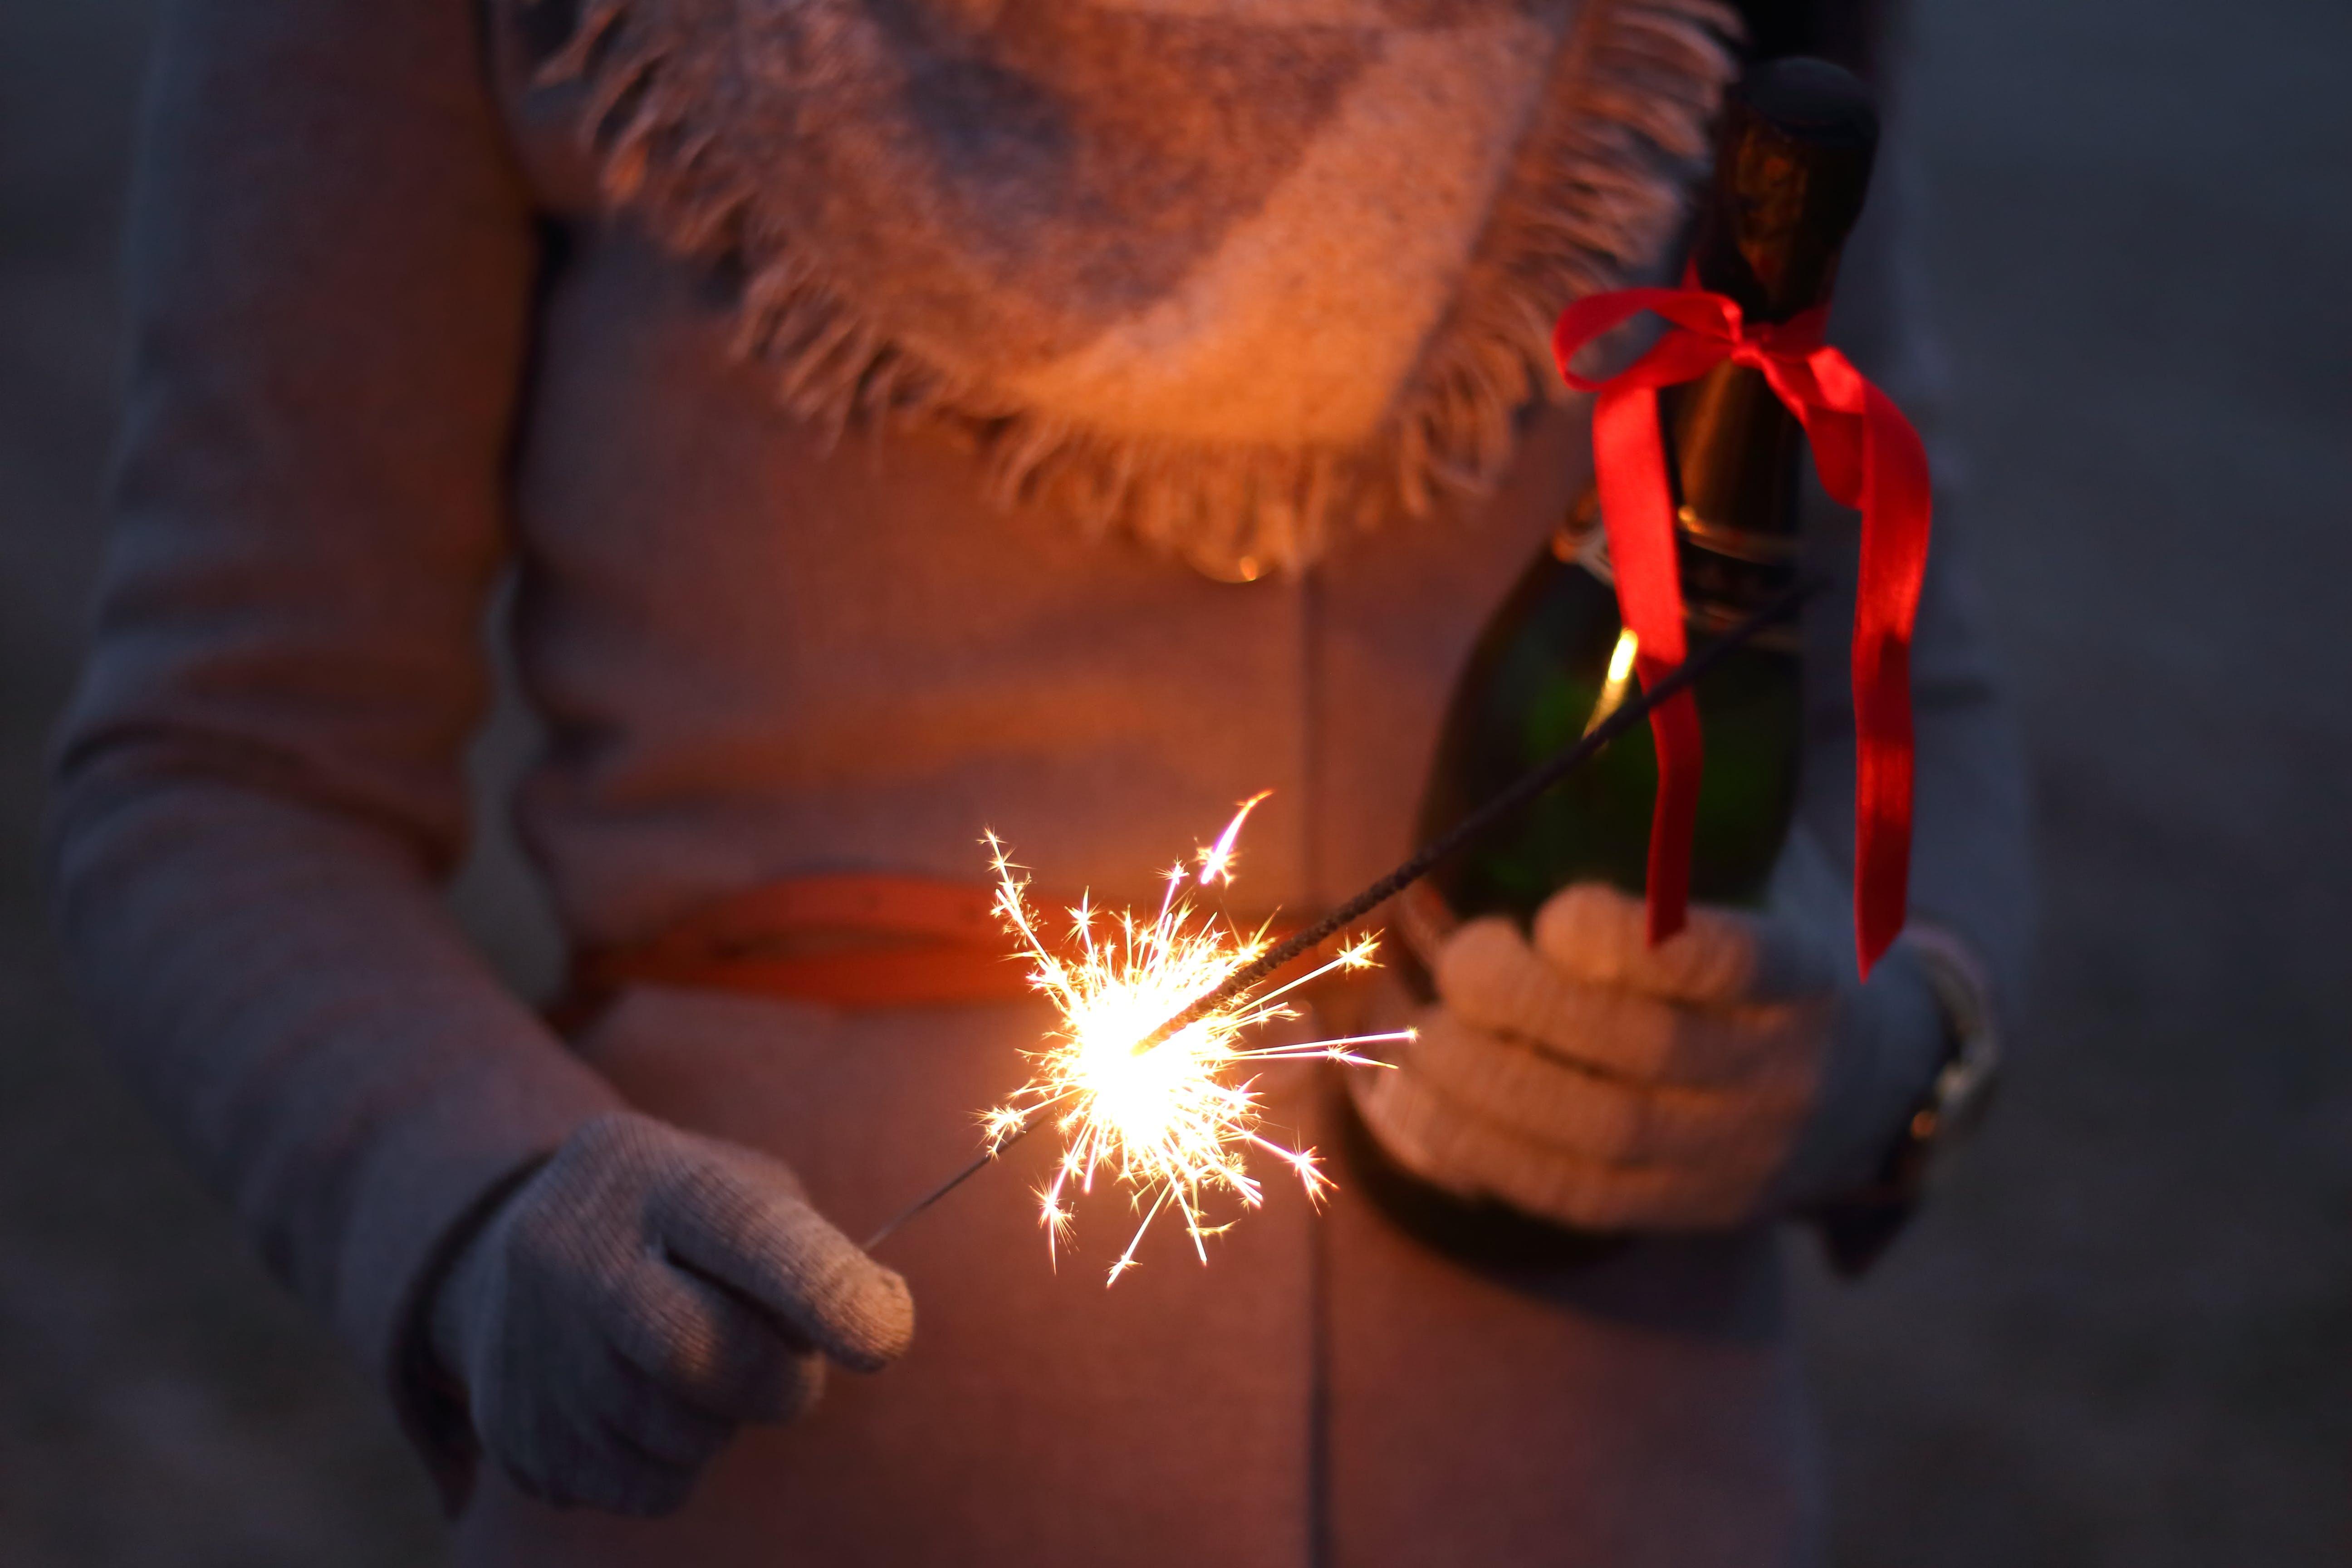 Kostenloses Stock Foto zu champagner, dunkel, feier, flamme